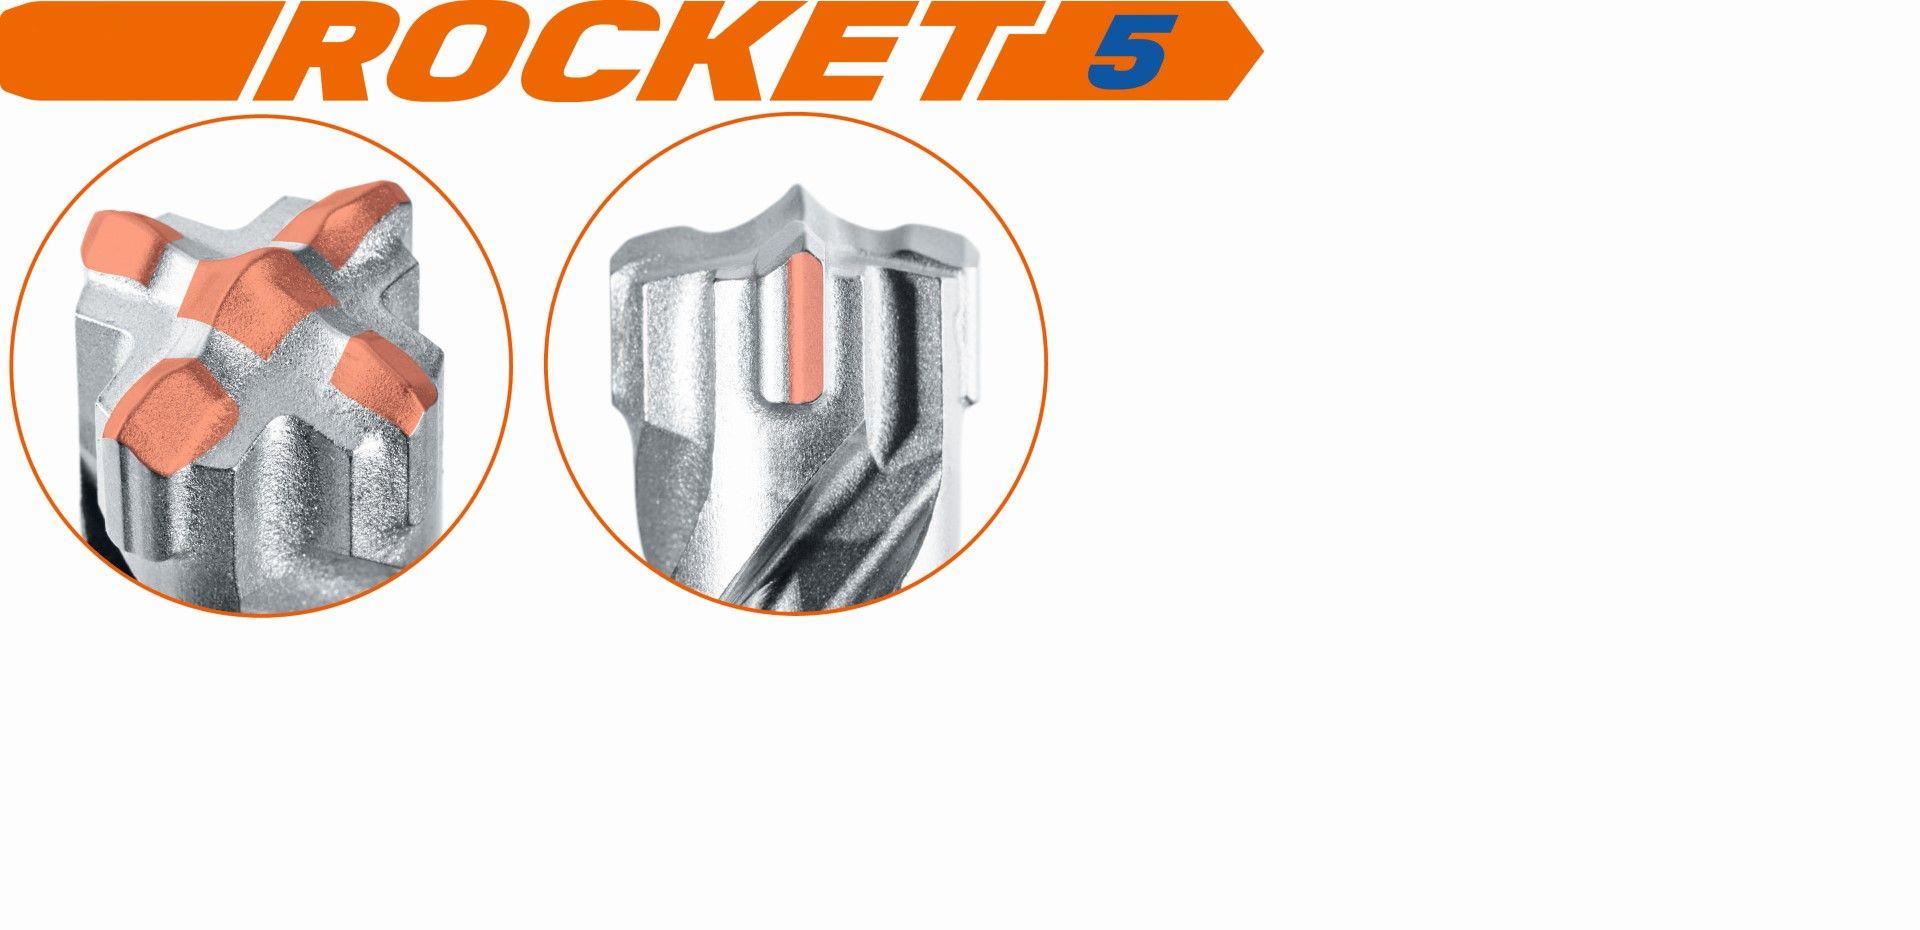 Slika BORER Rocket 5 SDS-plus 14x210mm 4-kraka